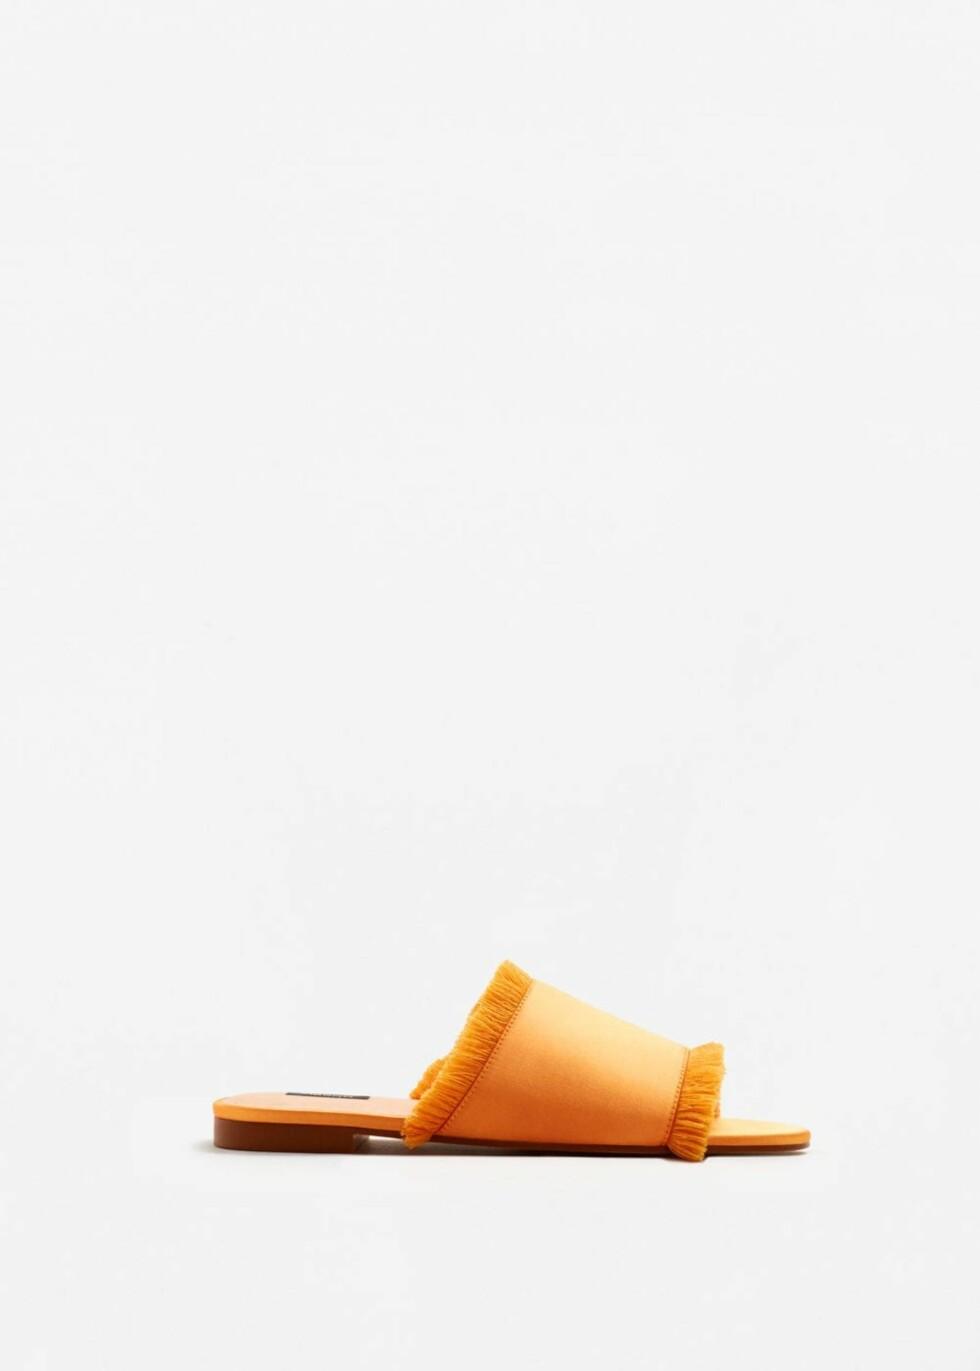 Sandaler fra Mango | kr 299 | http://shop.mango.com/NO/p1/damer/tilbeh%C3%B8r/sko/flate-sandaler/sandaler-i-sateng-med-frynser?id=83019048_20&n=1&s=accesorios.zapatos&ts=1496053539526